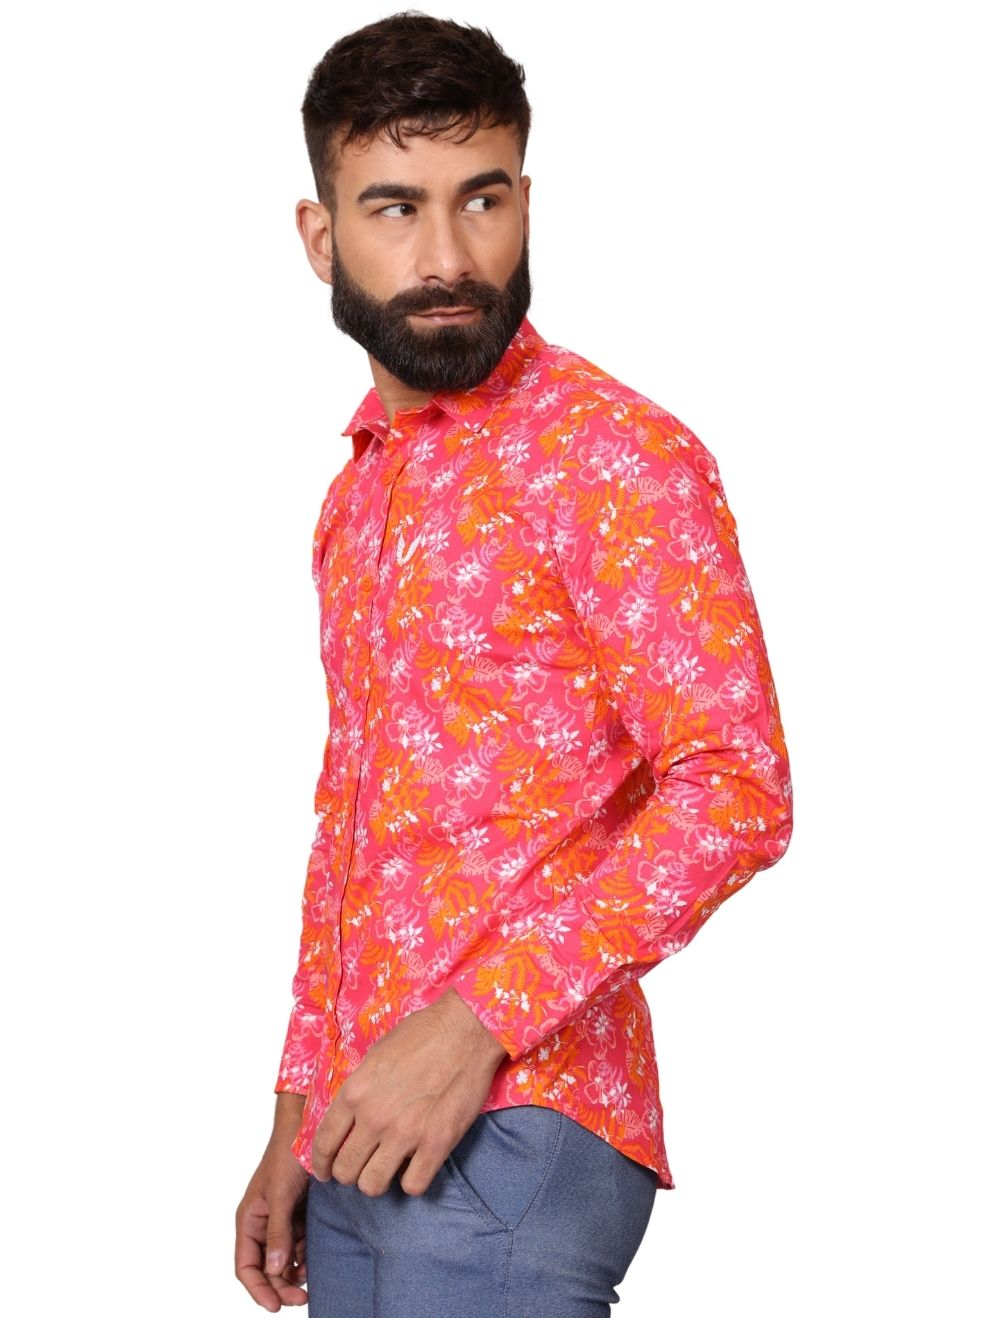 Camisa Masculina Slim Manga Longa com Elastano Vermelha